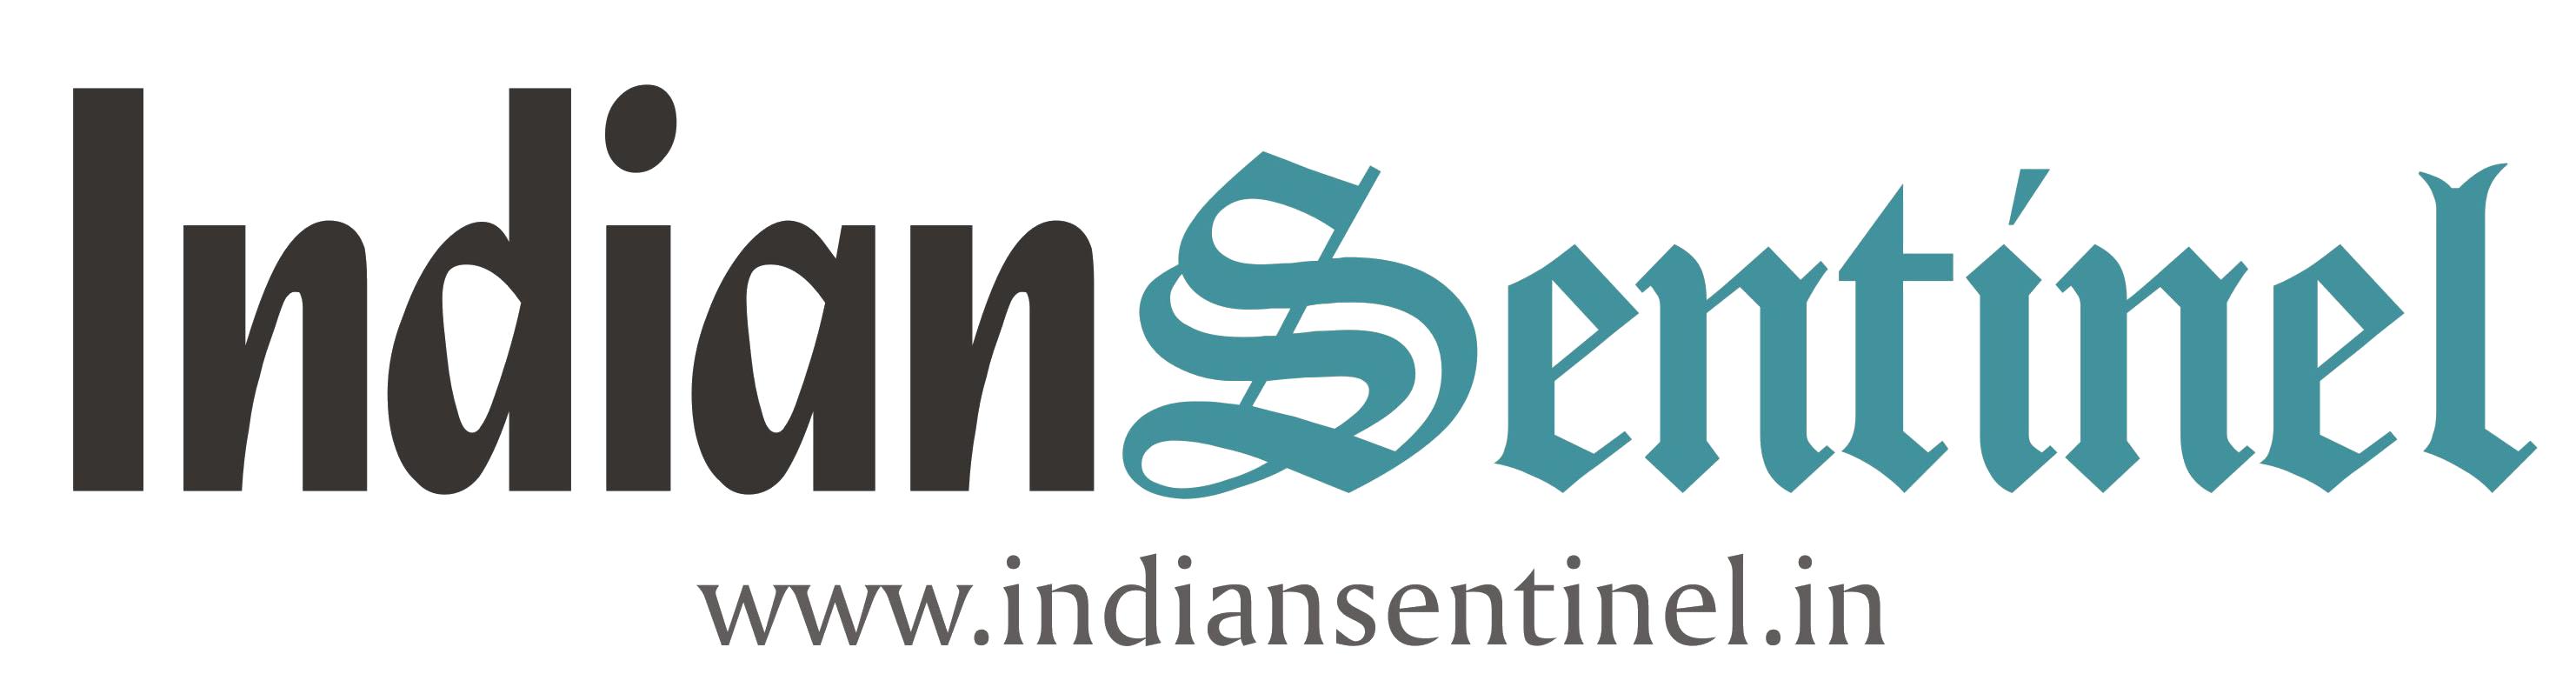 Indian Sentinel